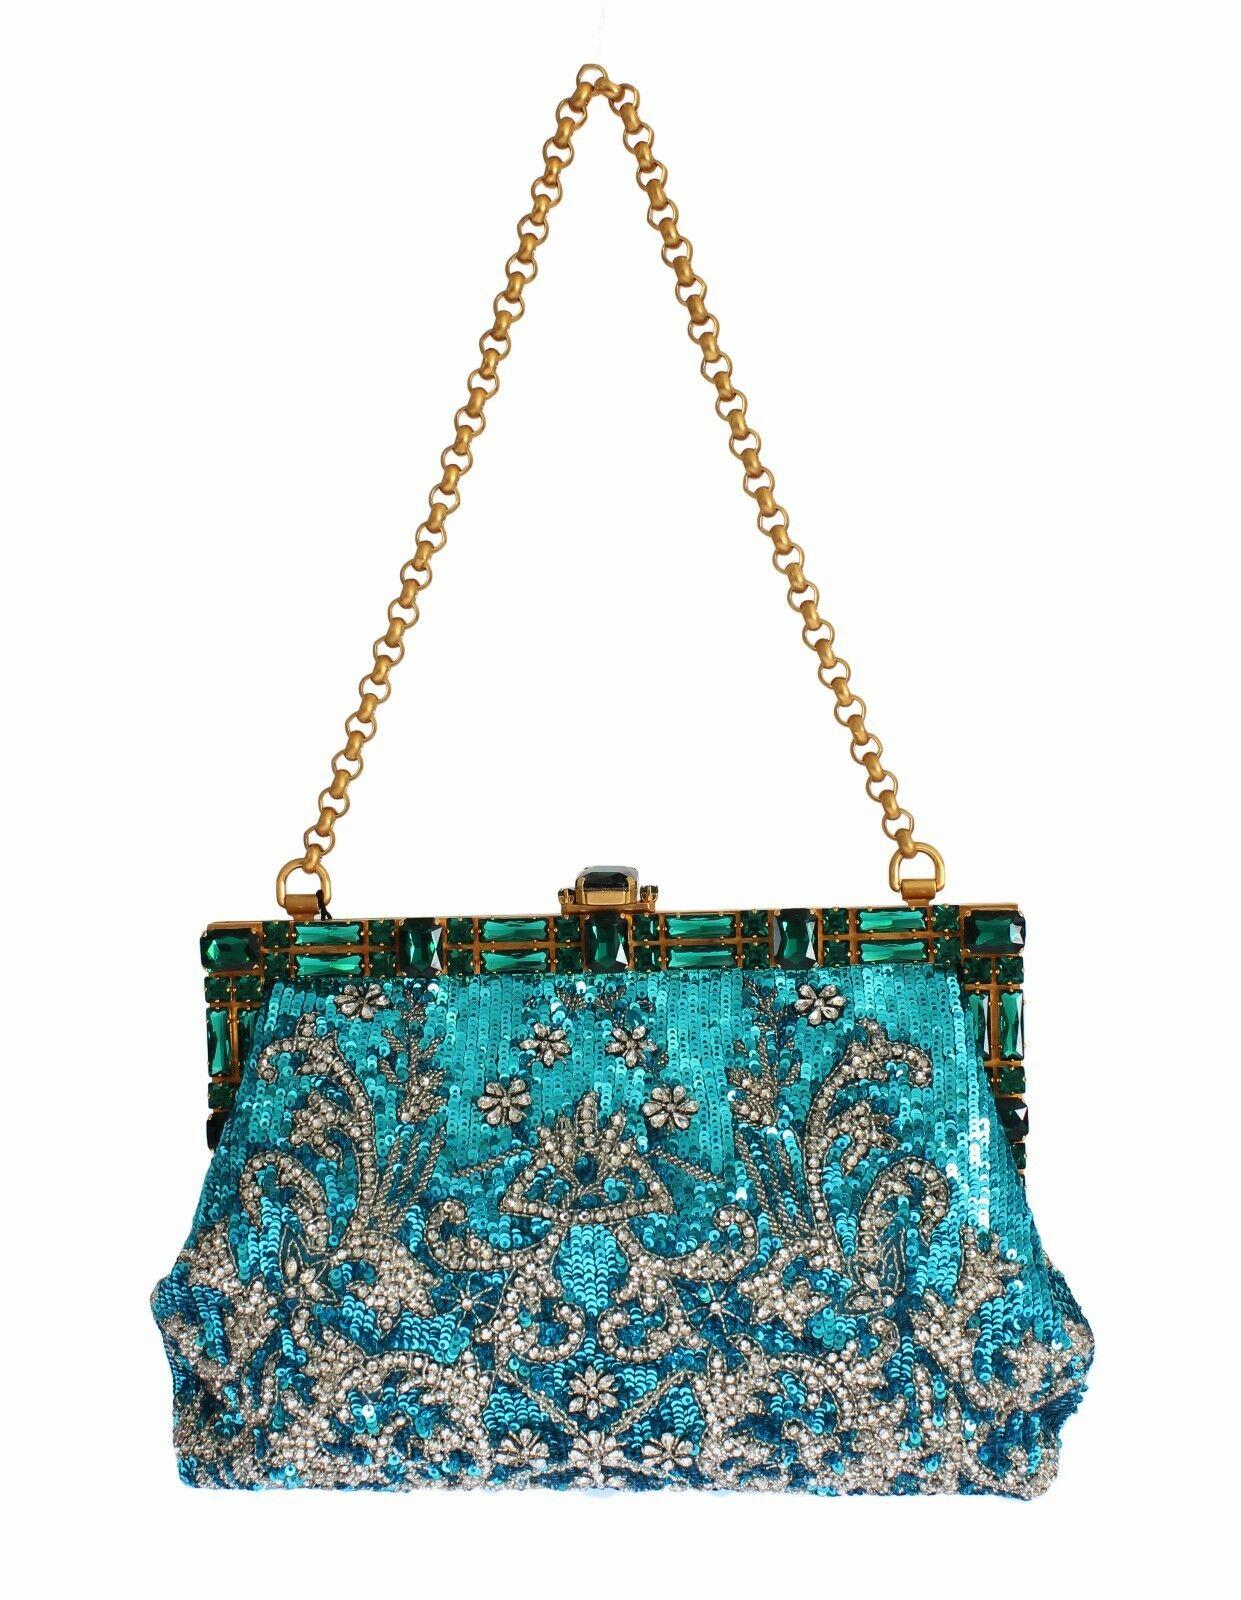 Dolce & Gabbana Women's Clear Crystal Evening Clutch Bag Blue SIG19544